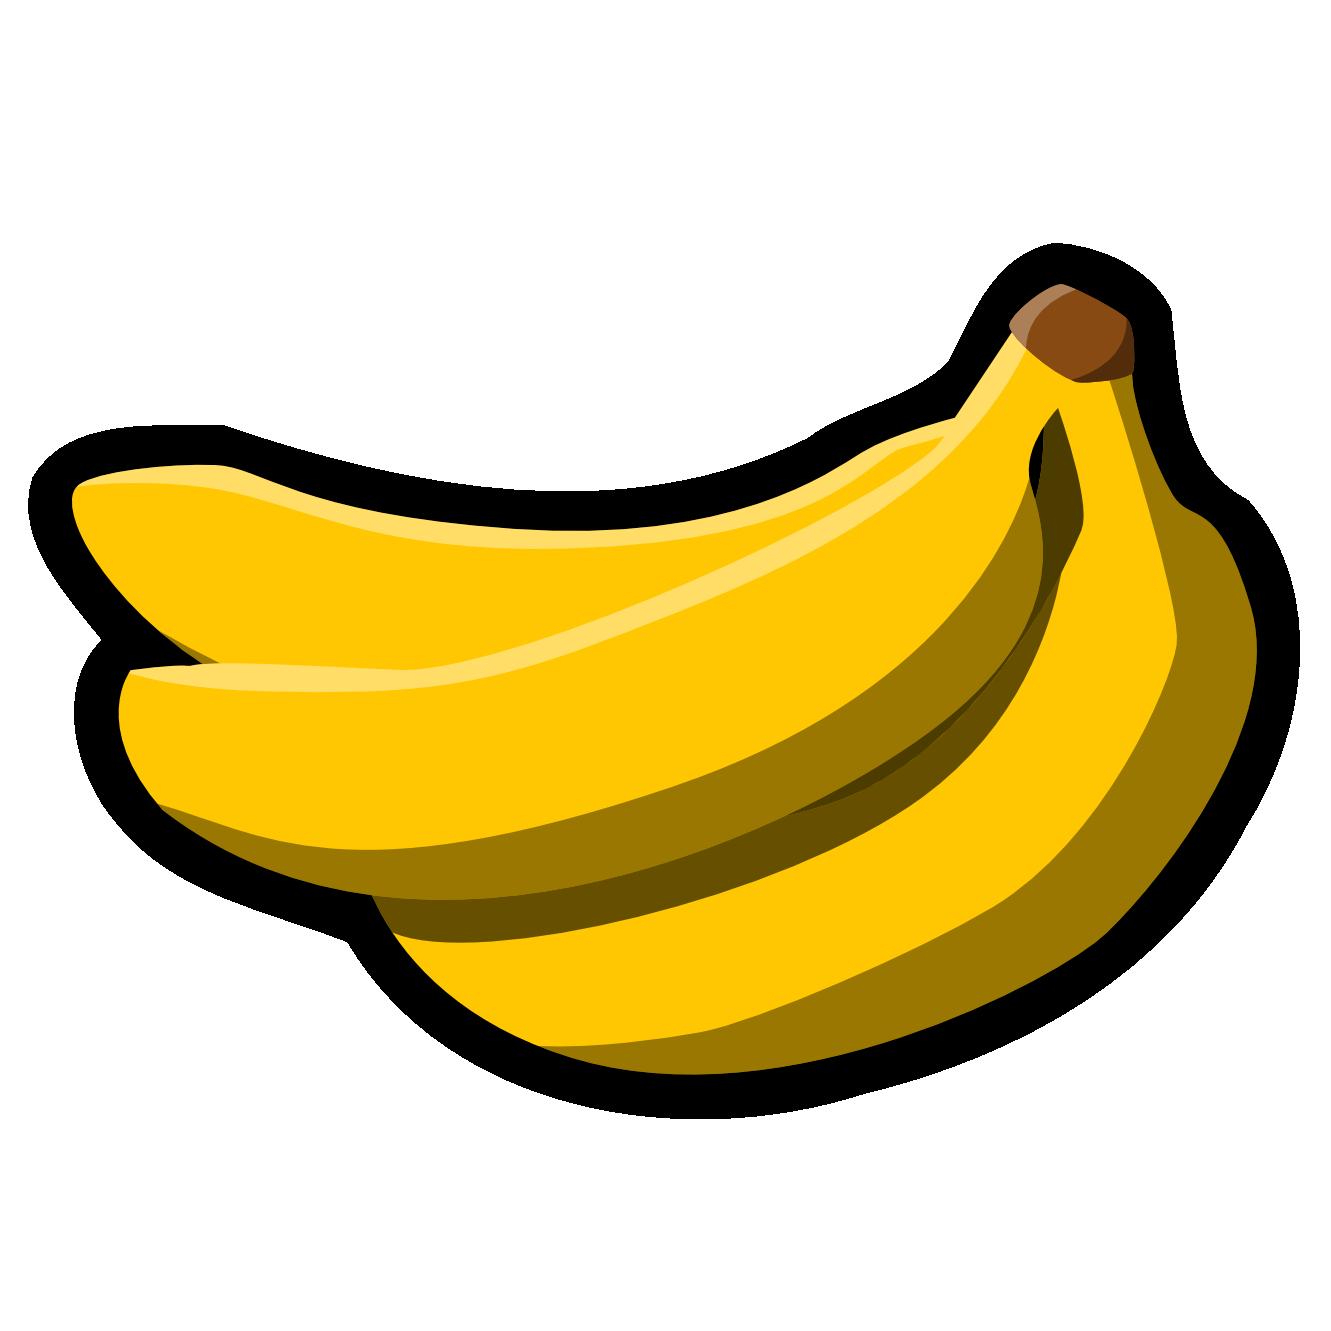 1331x1331 Banana Clip Art Black And Clipart Panda